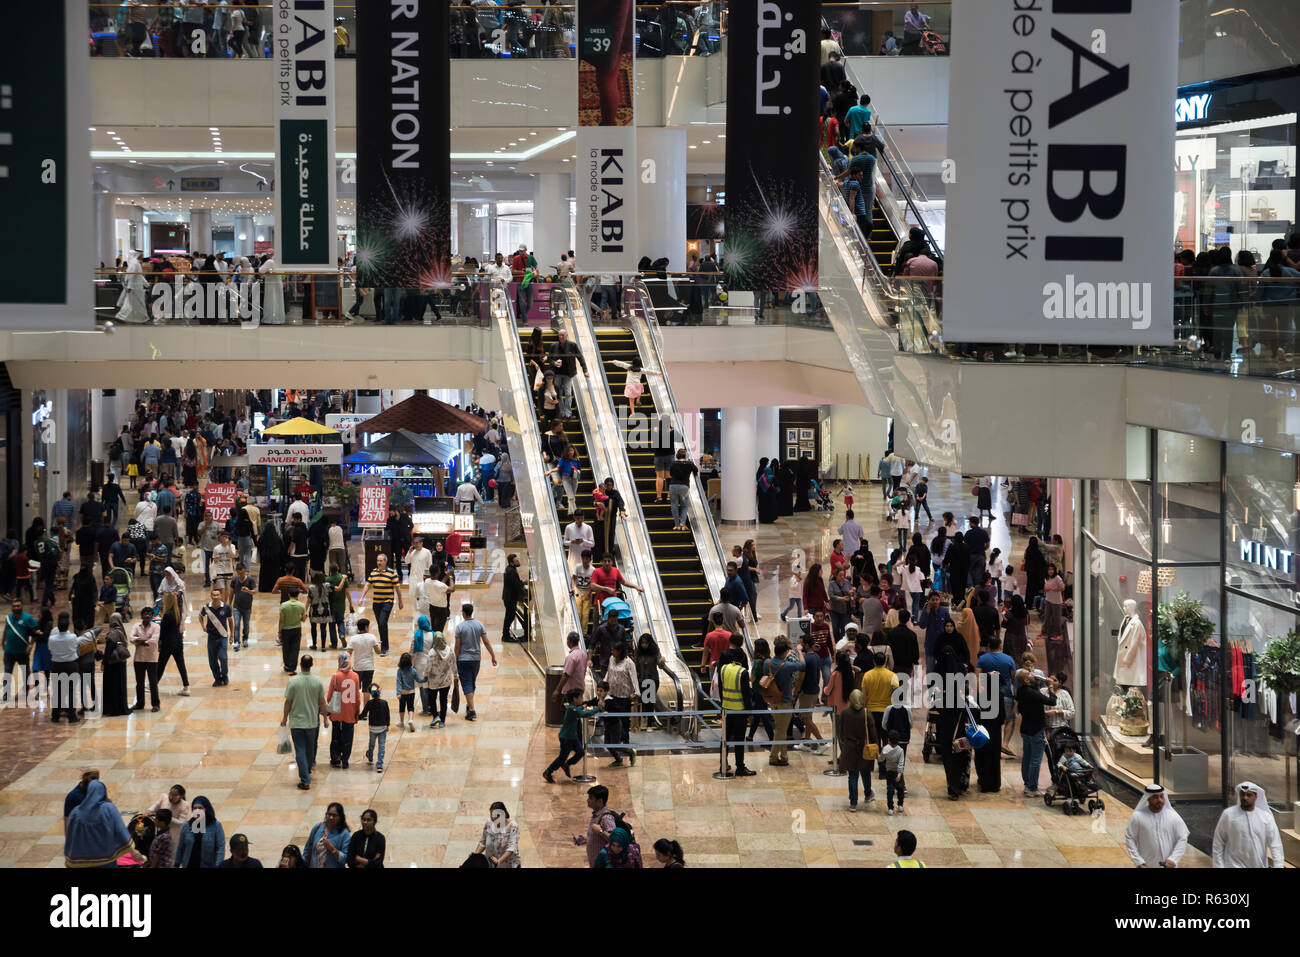 Dubai, UAE. December 2, 2018 - Dubai Festival City, Dubai, UAE: Crowed at Dubai Festival City Shopping Mall on the occasion of 47th UAE National Day. Credit: Fahd Khan/Alamy Live News Stock Photo